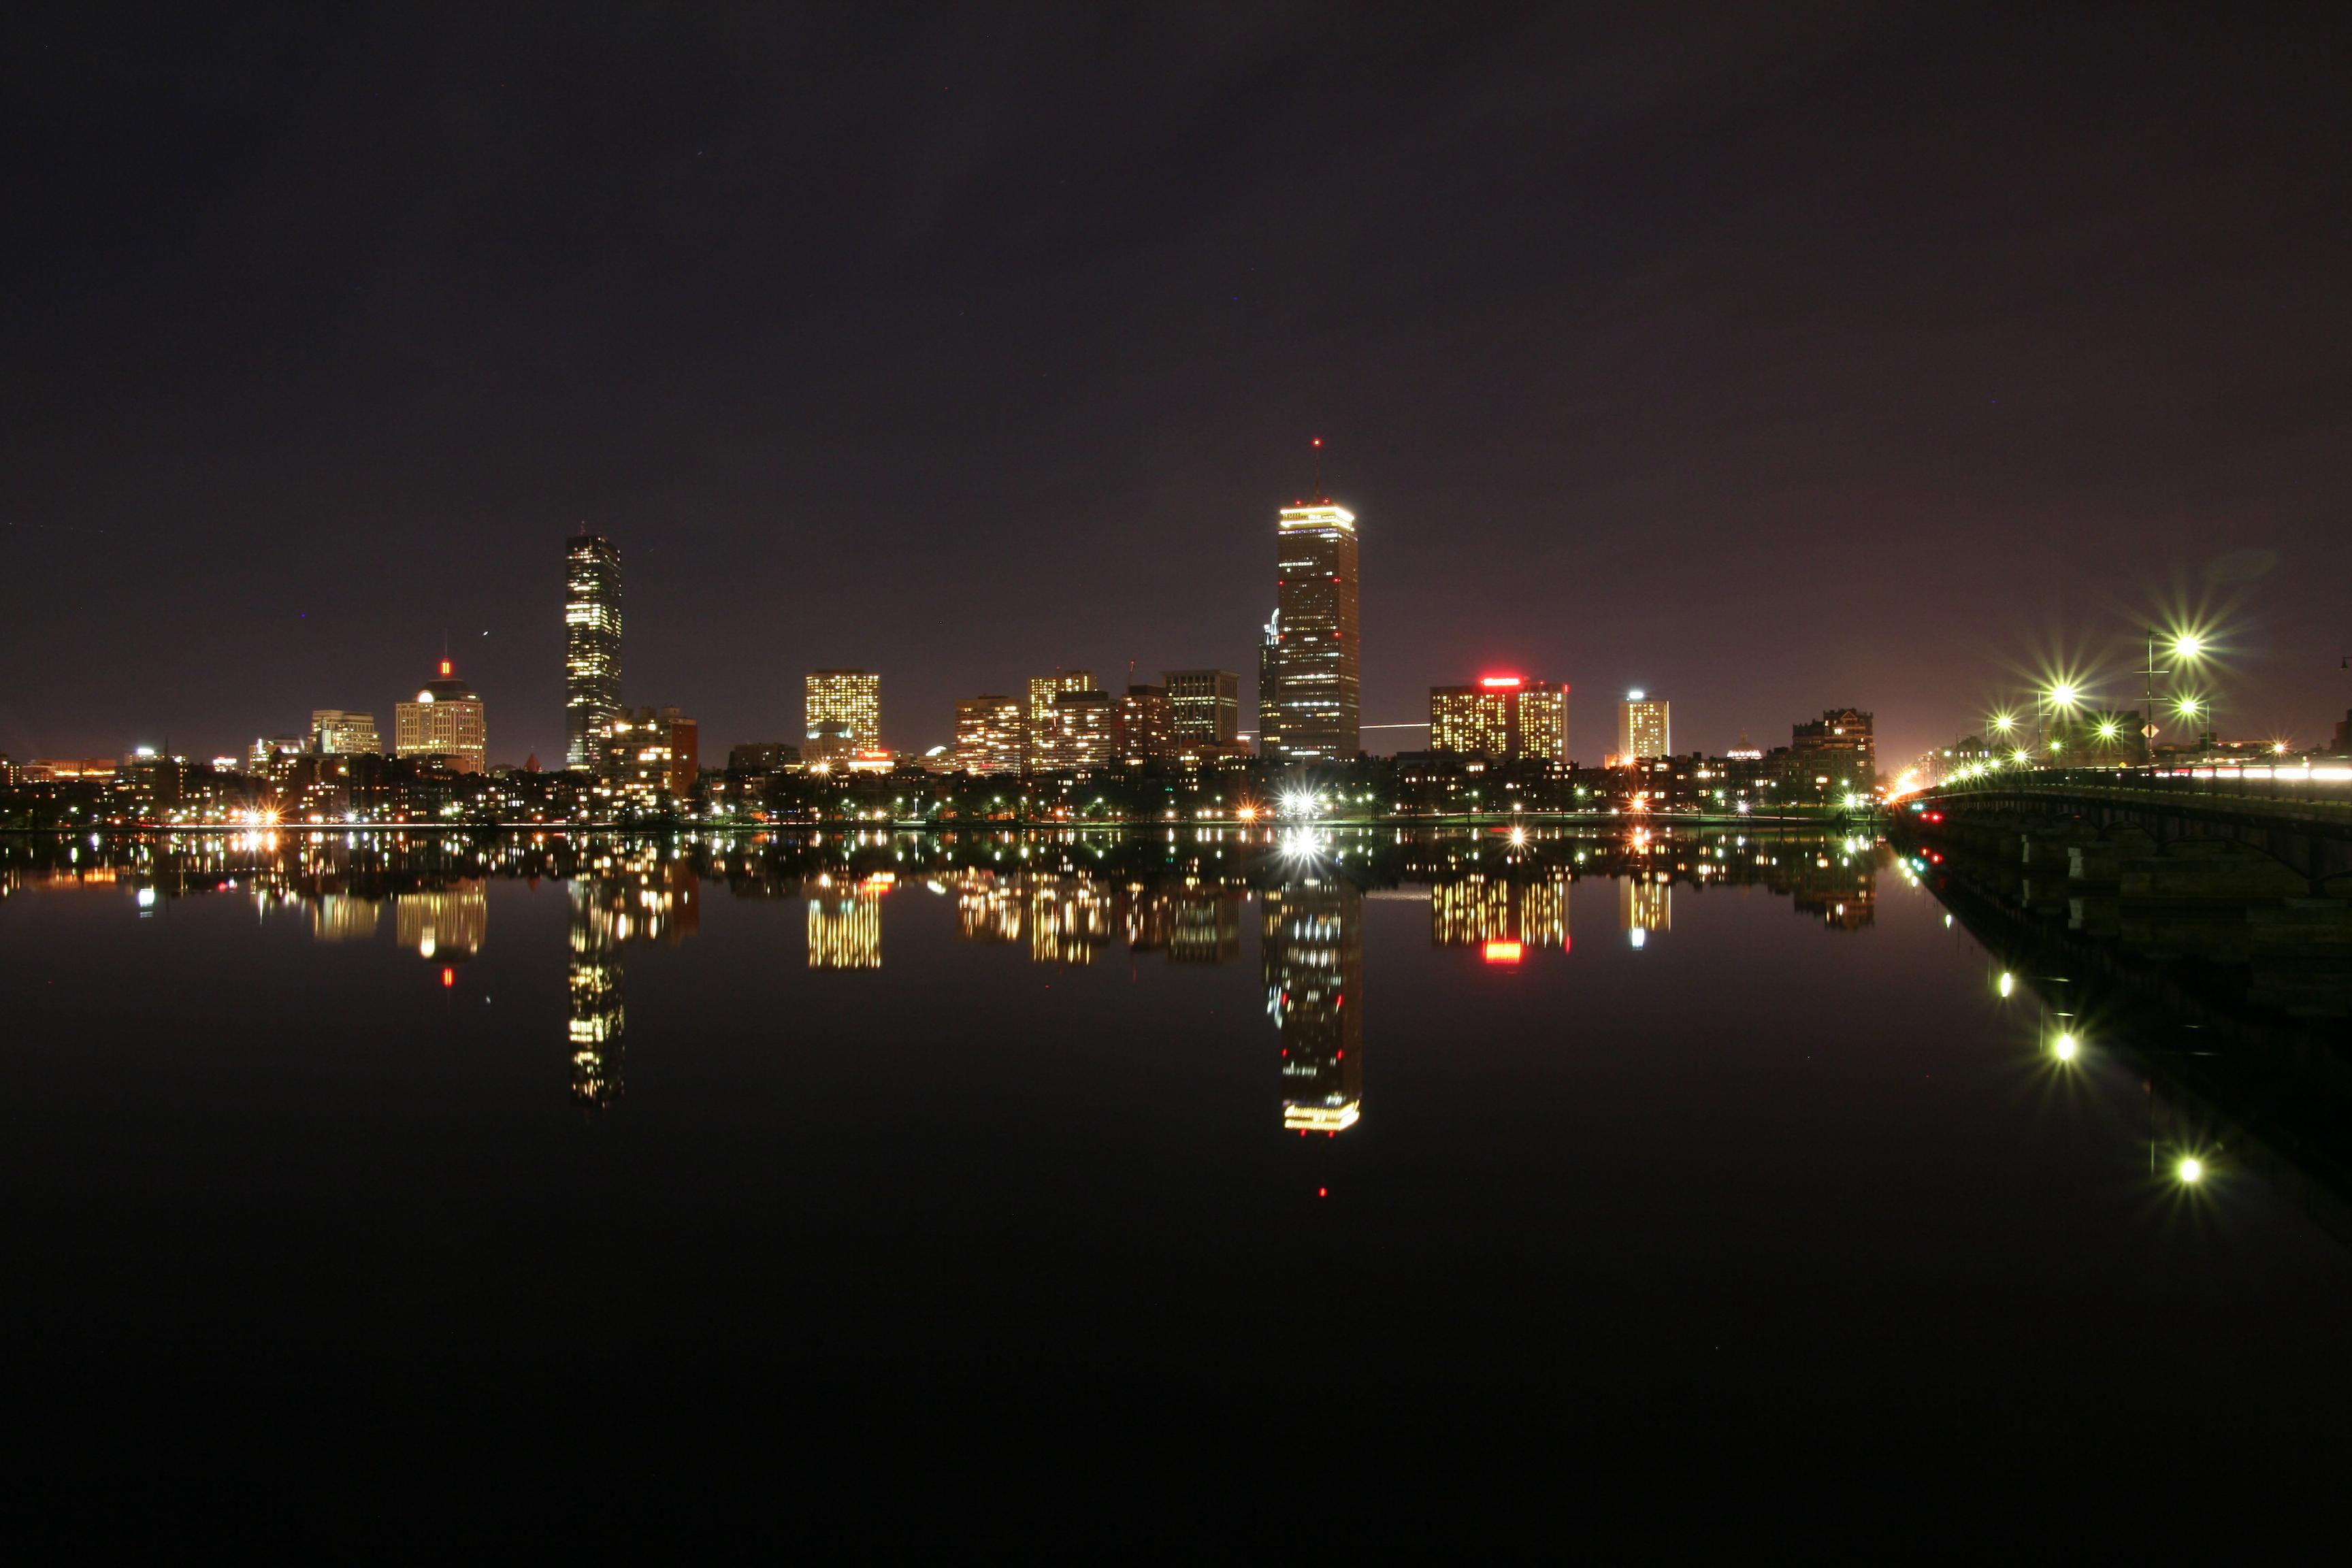 Boston City pics « ajroza